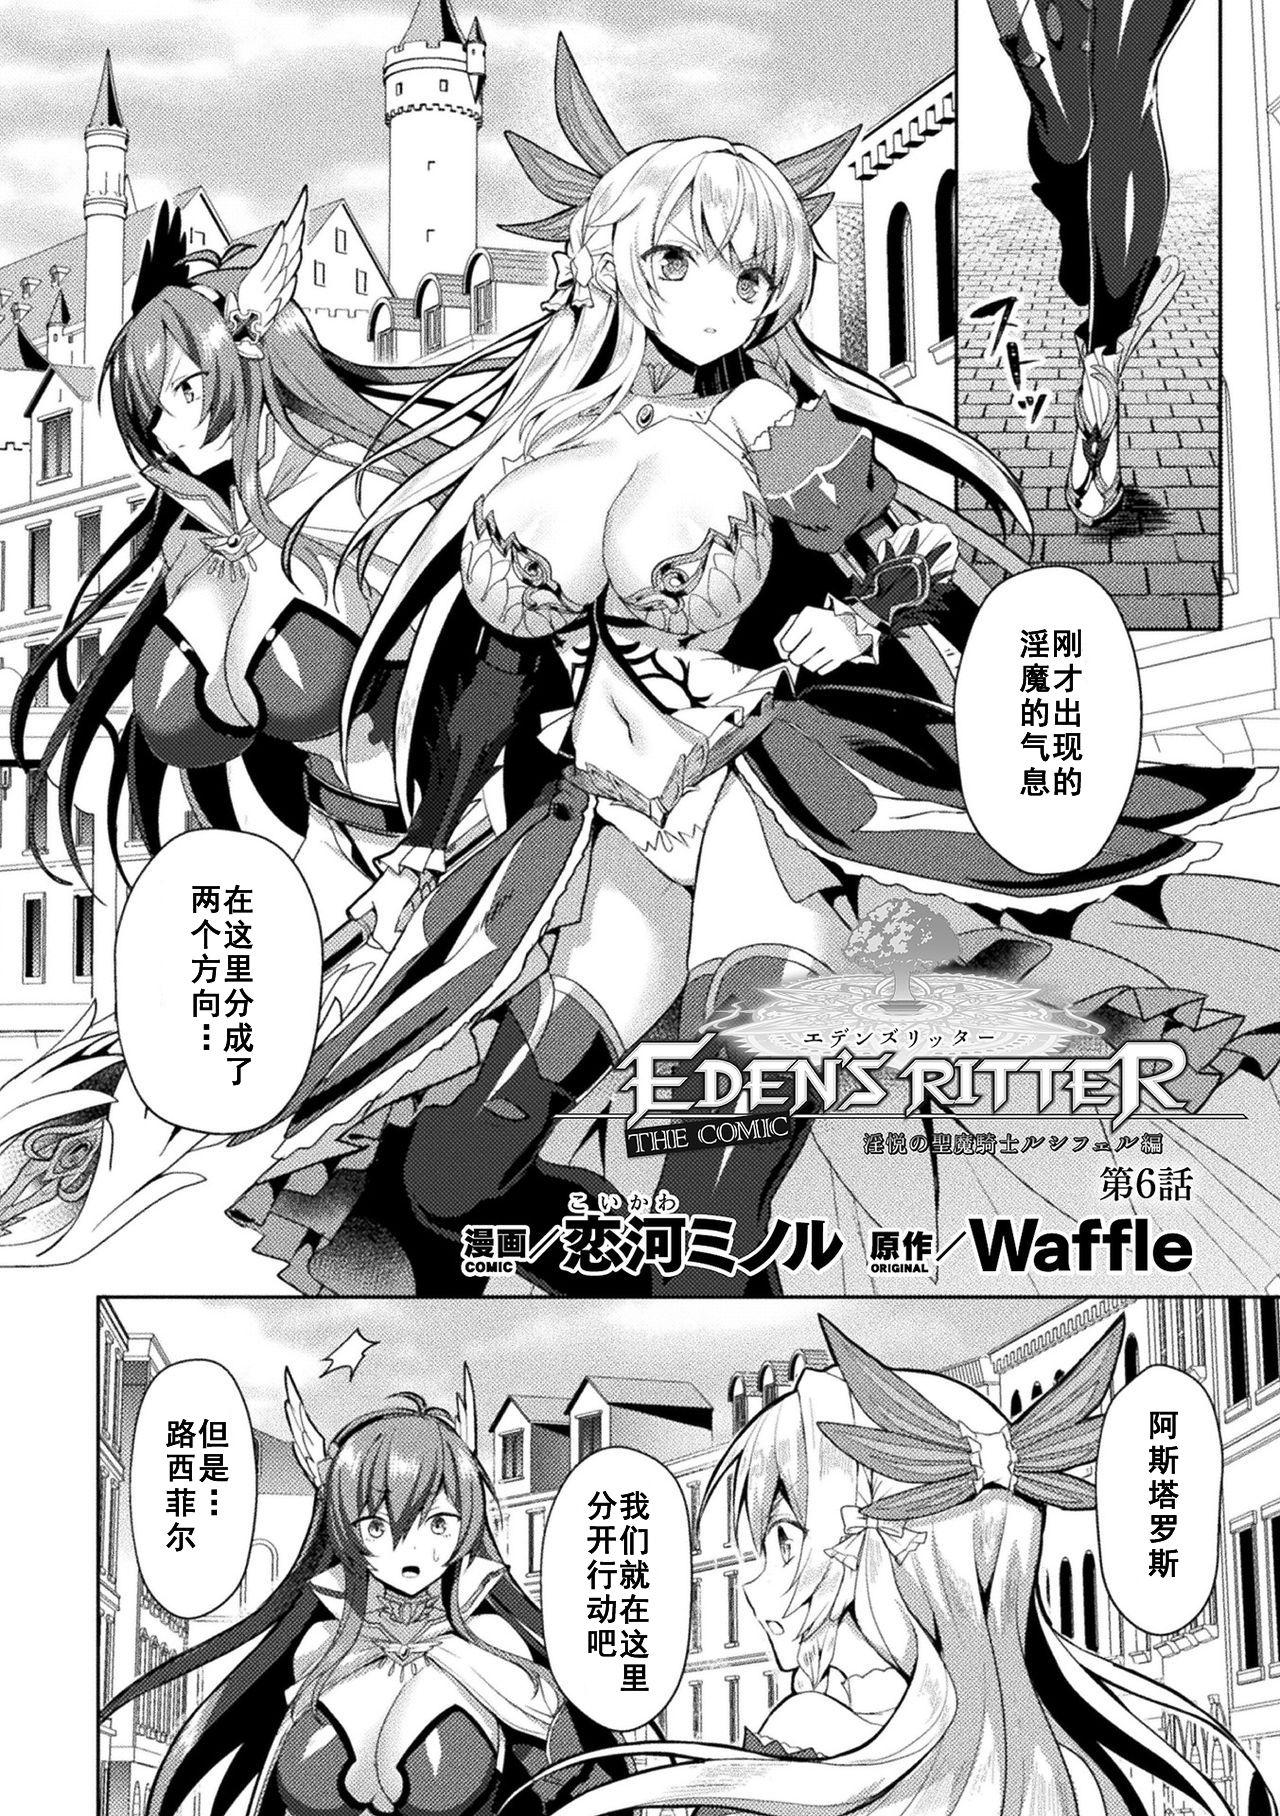 Eden's Ritter - Inetsu no Seima Kishi Lucifer Hen THE COMIC Ch. 6 0